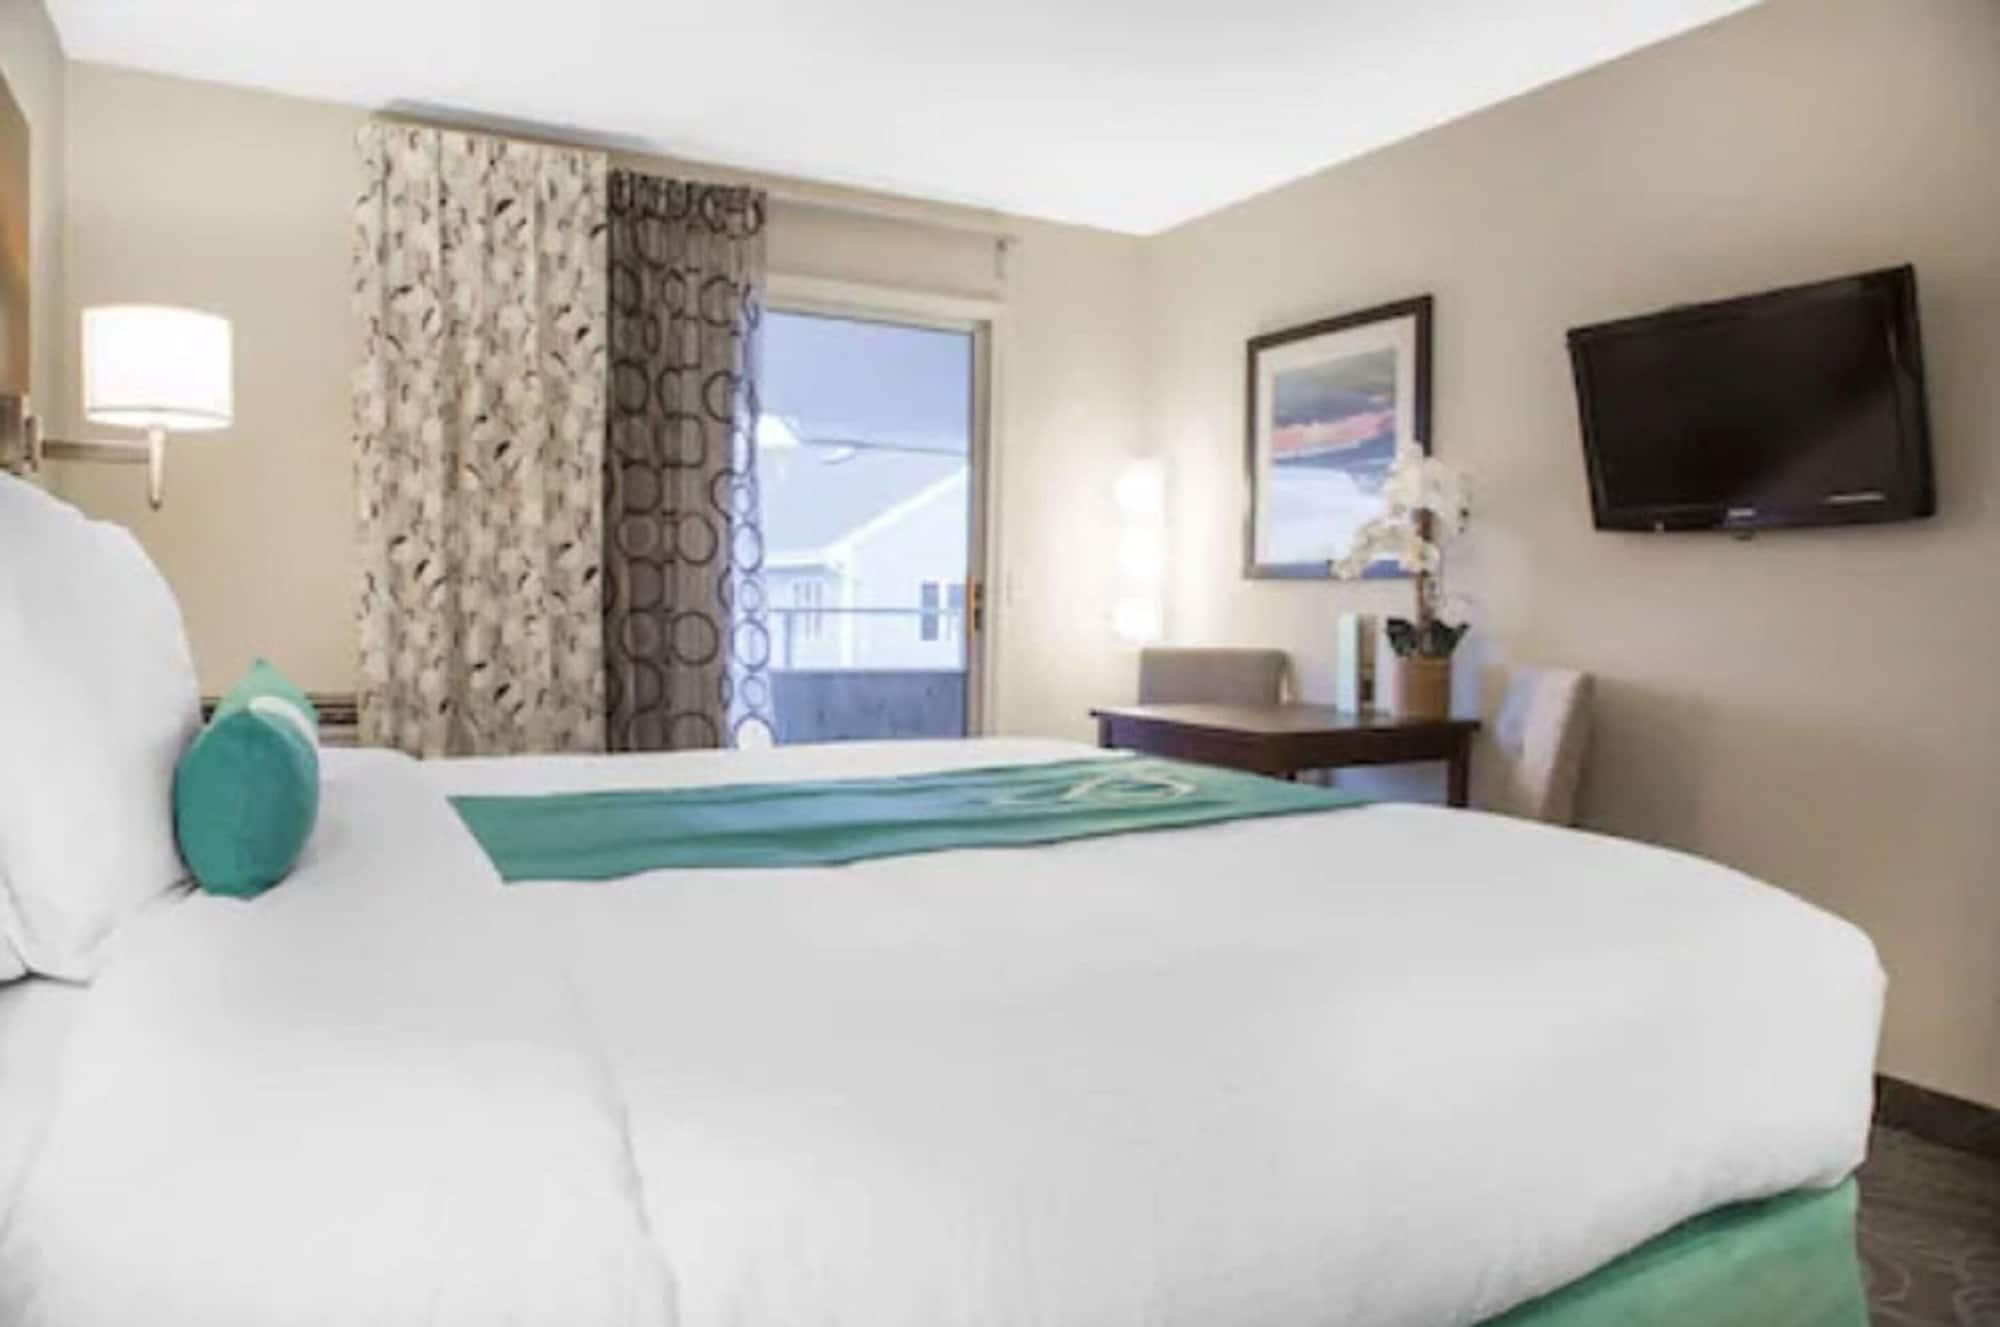 Aqua Blue Hotel & Conference Center, Washington